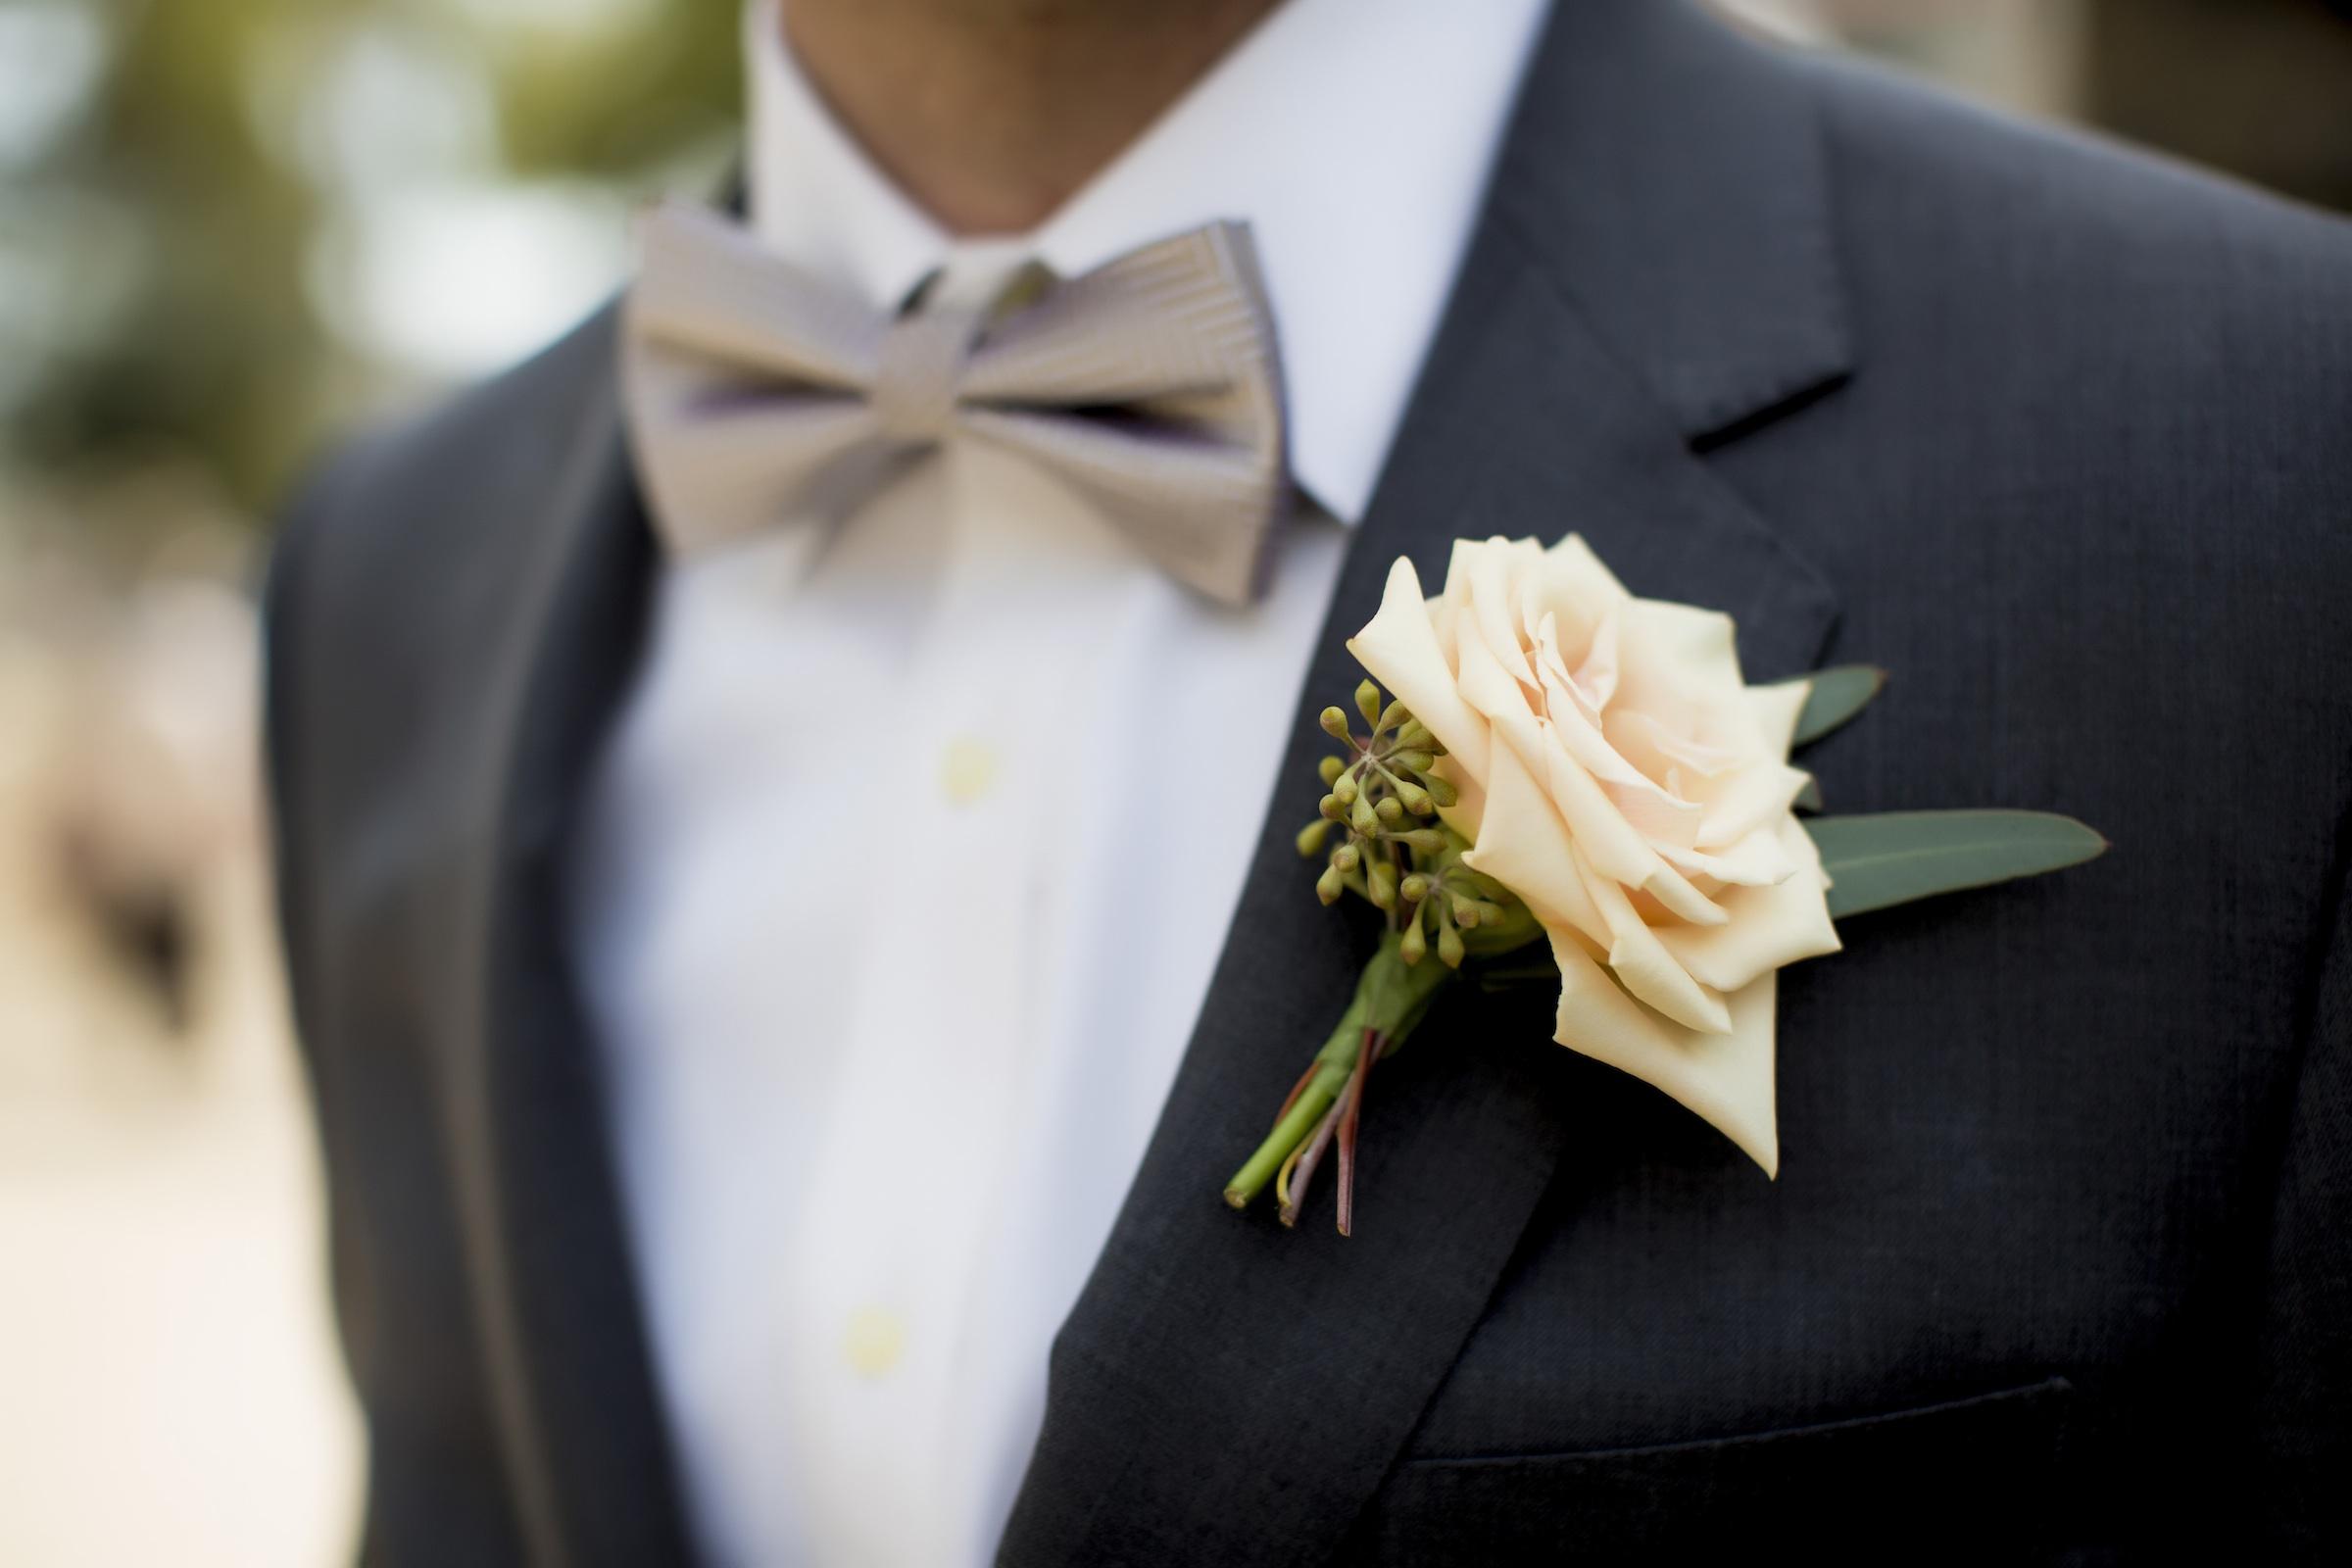 classic-grooms-attire-charcoal-suit-pastel-peach-rose-boutonniere.original